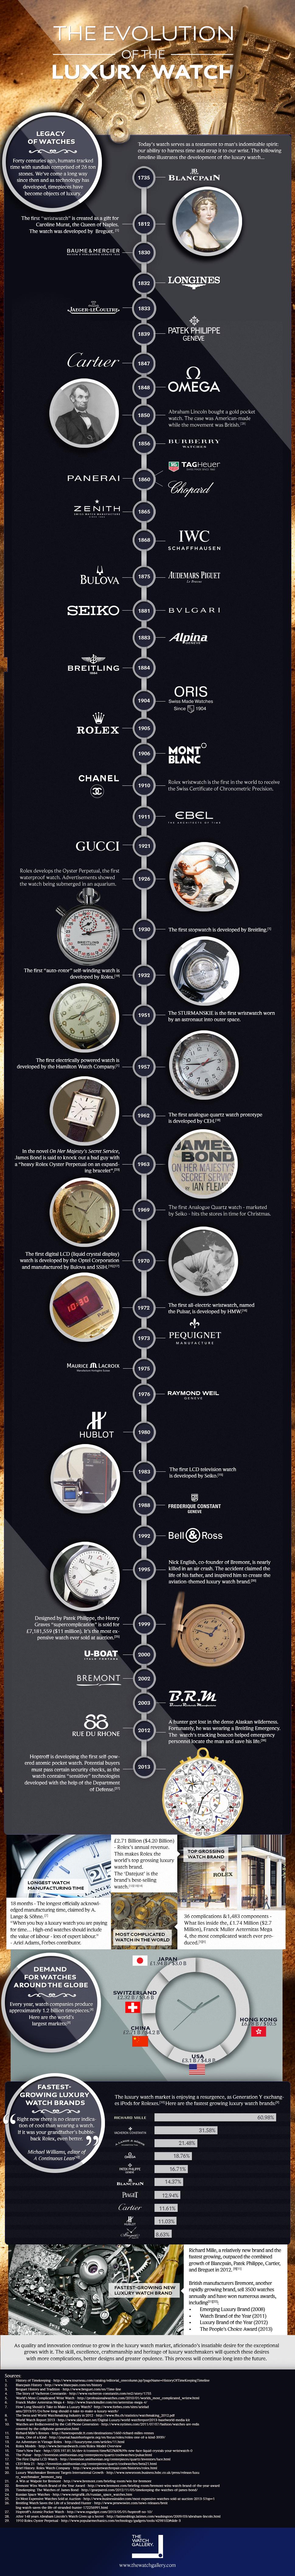 Evolution of the Luxury Watch